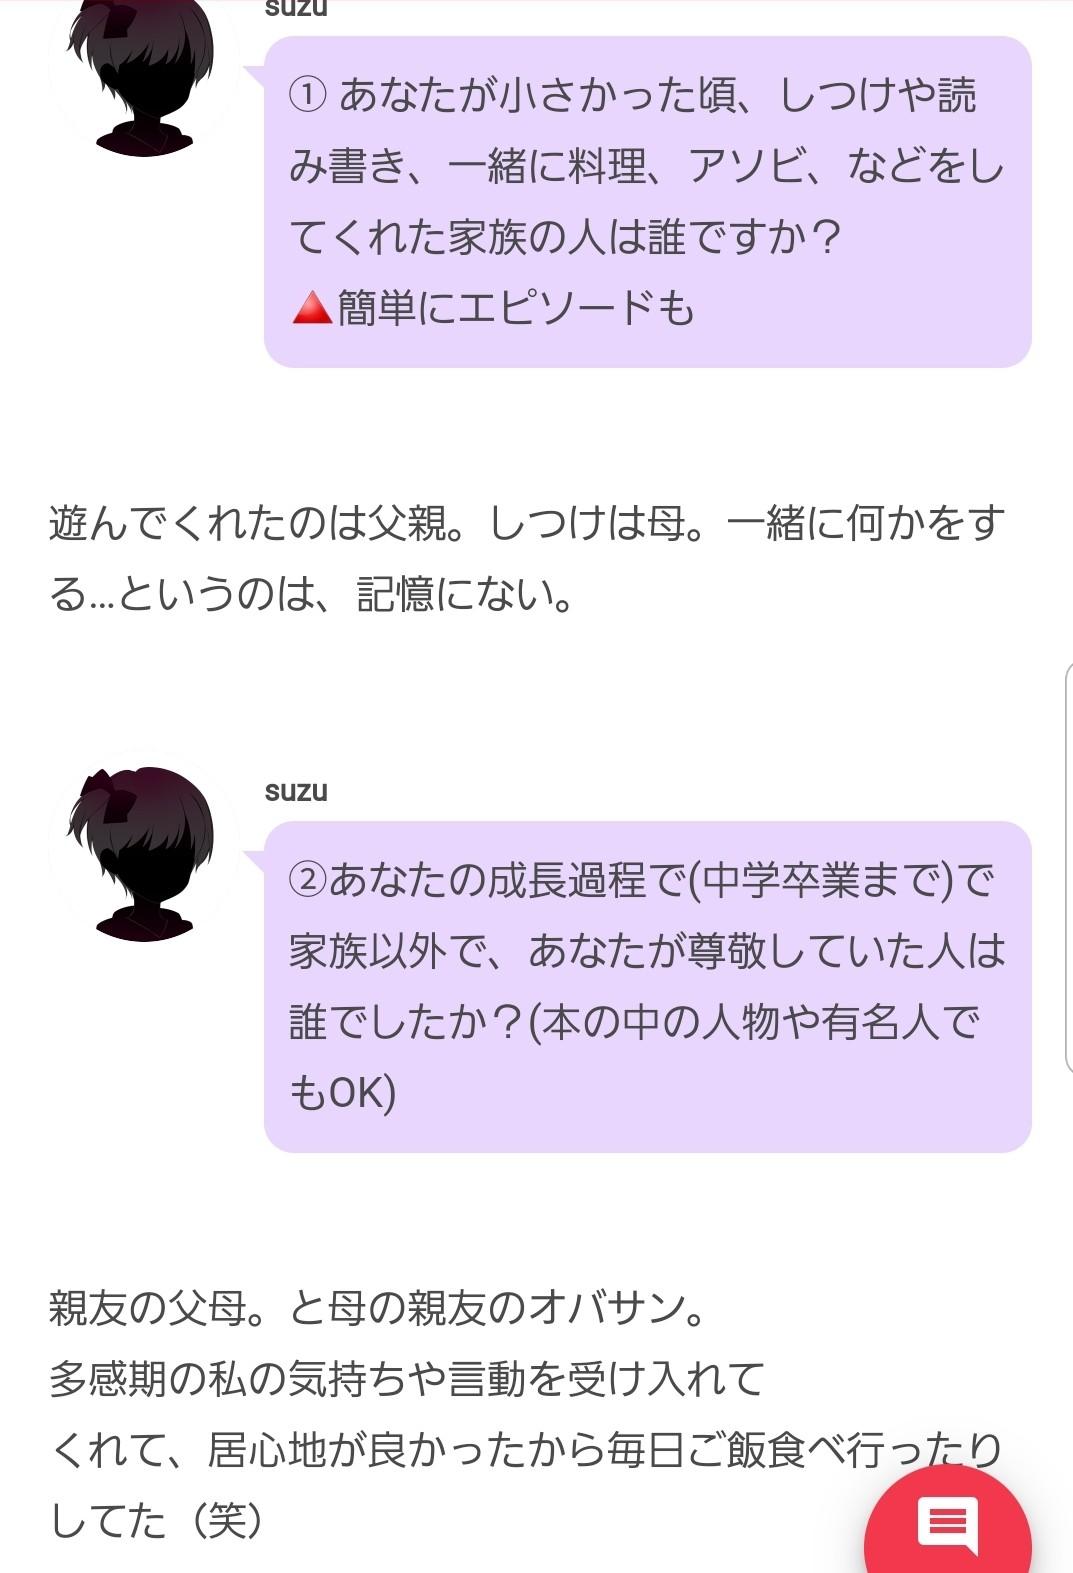 f:id:yuyu-s:20200509172350j:image